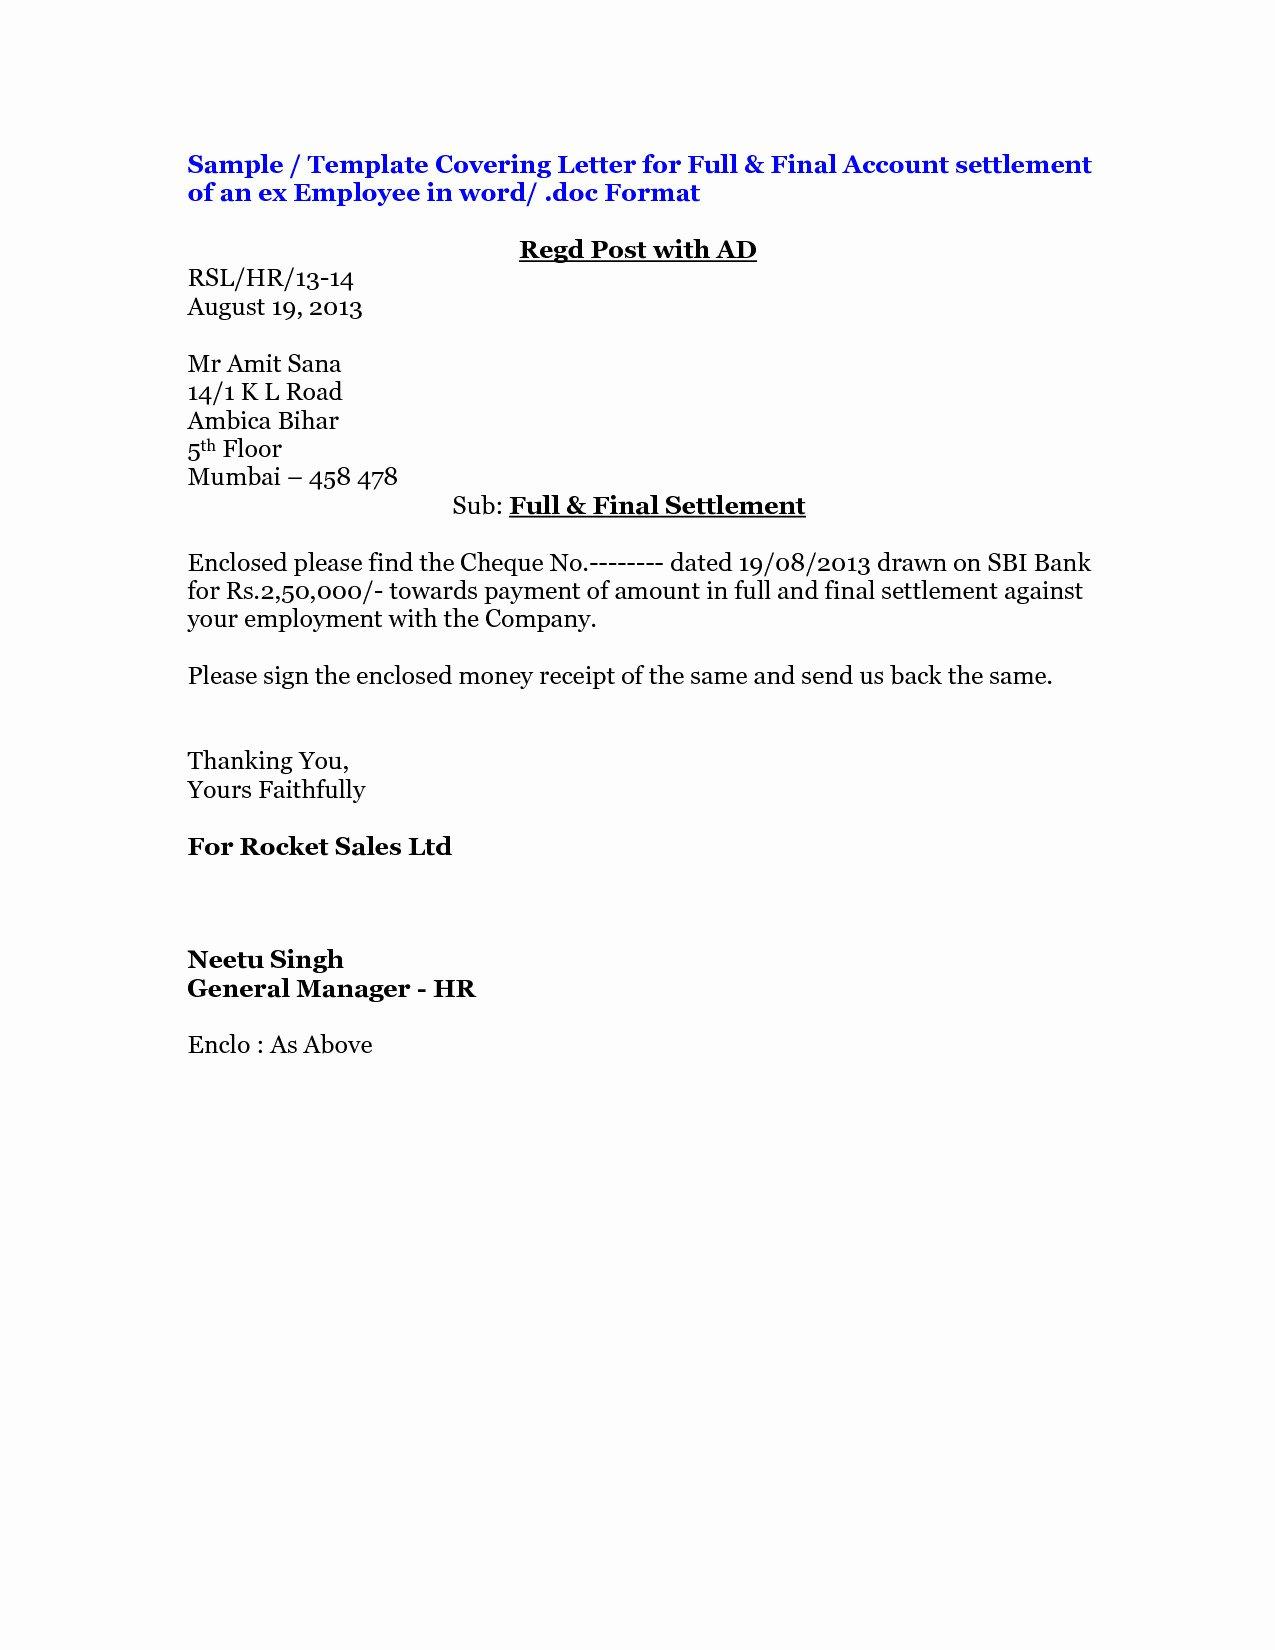 Car Accident Settlement Agreement Letter Unique Full and Final Settlement Letter Template Car Accident